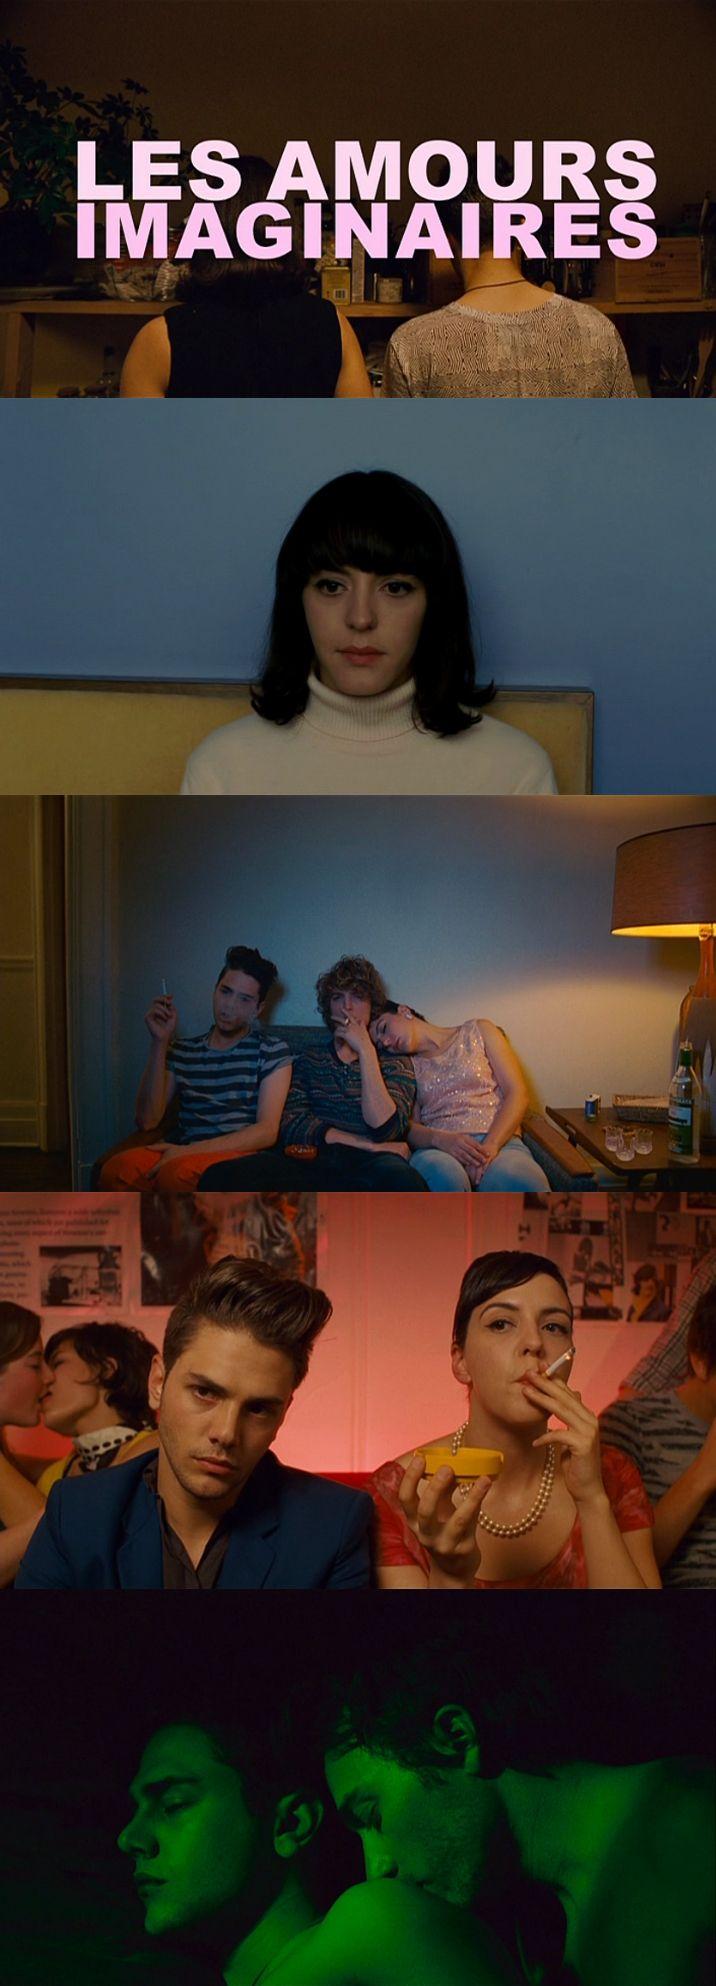 Heartbeats (Xavier Dolan, 2010) cinematography: Yves Bélanger